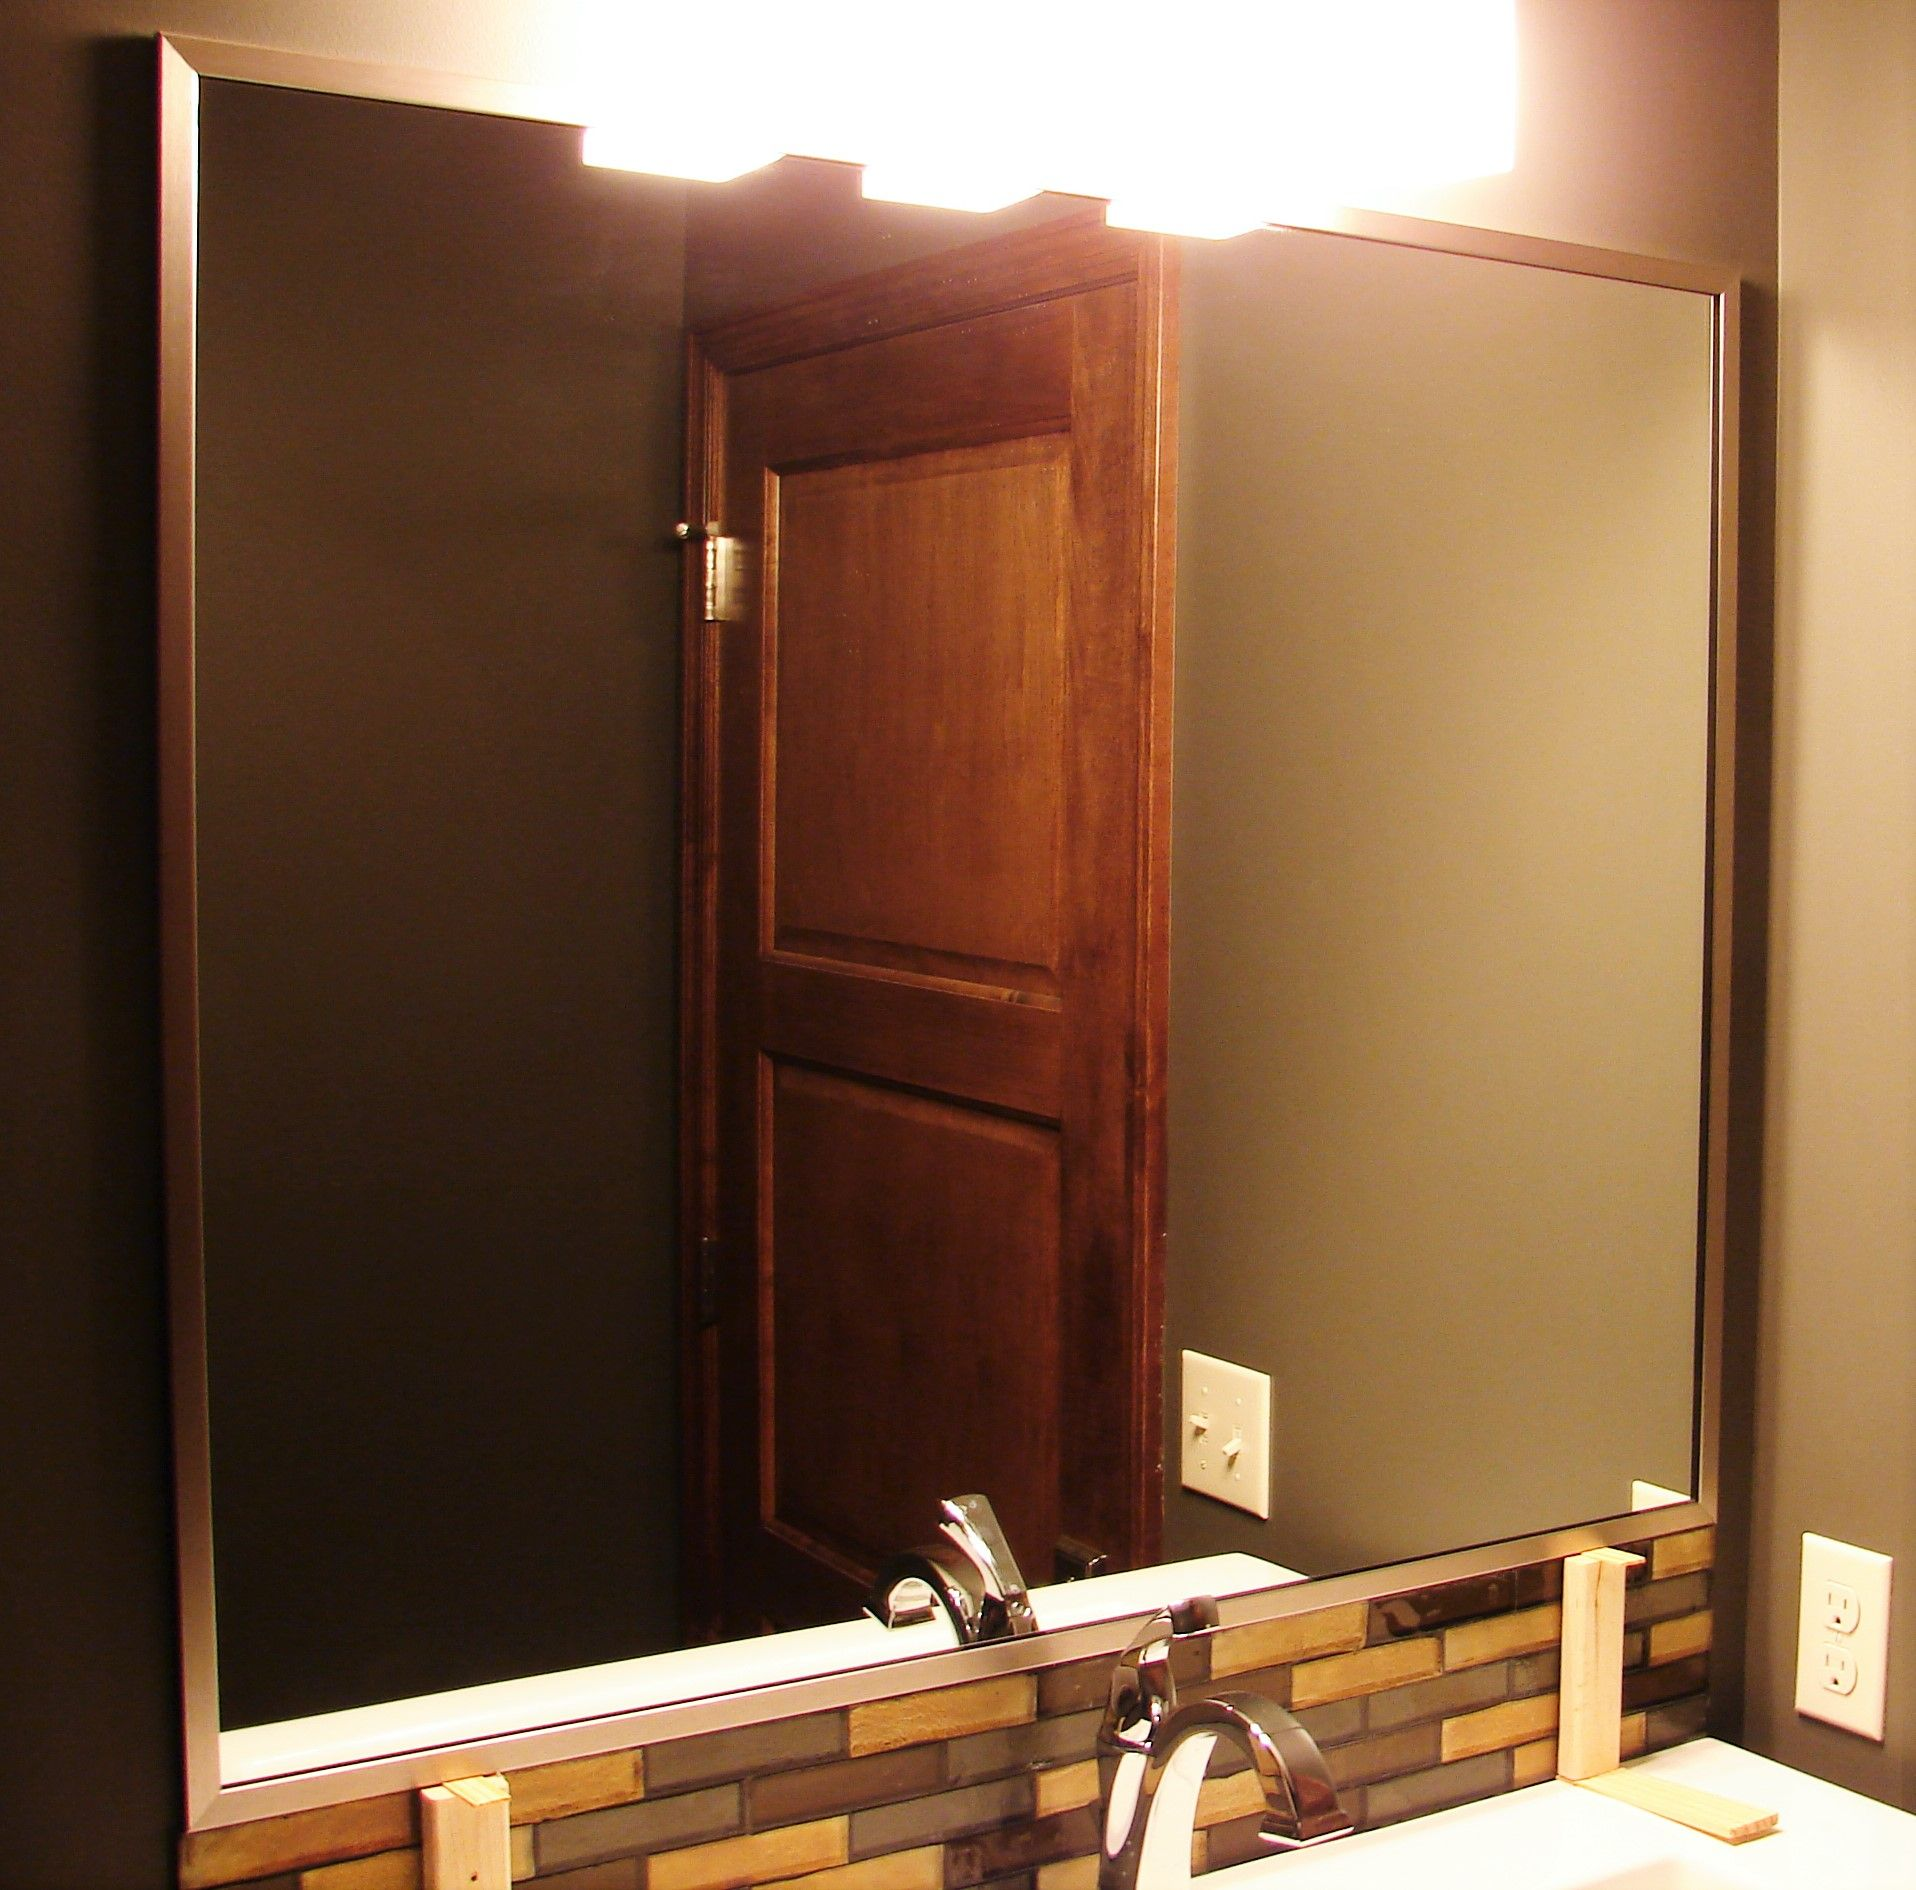 Bathroom Mirrors Omaha mirror in custom metal frame, installedelite glass services